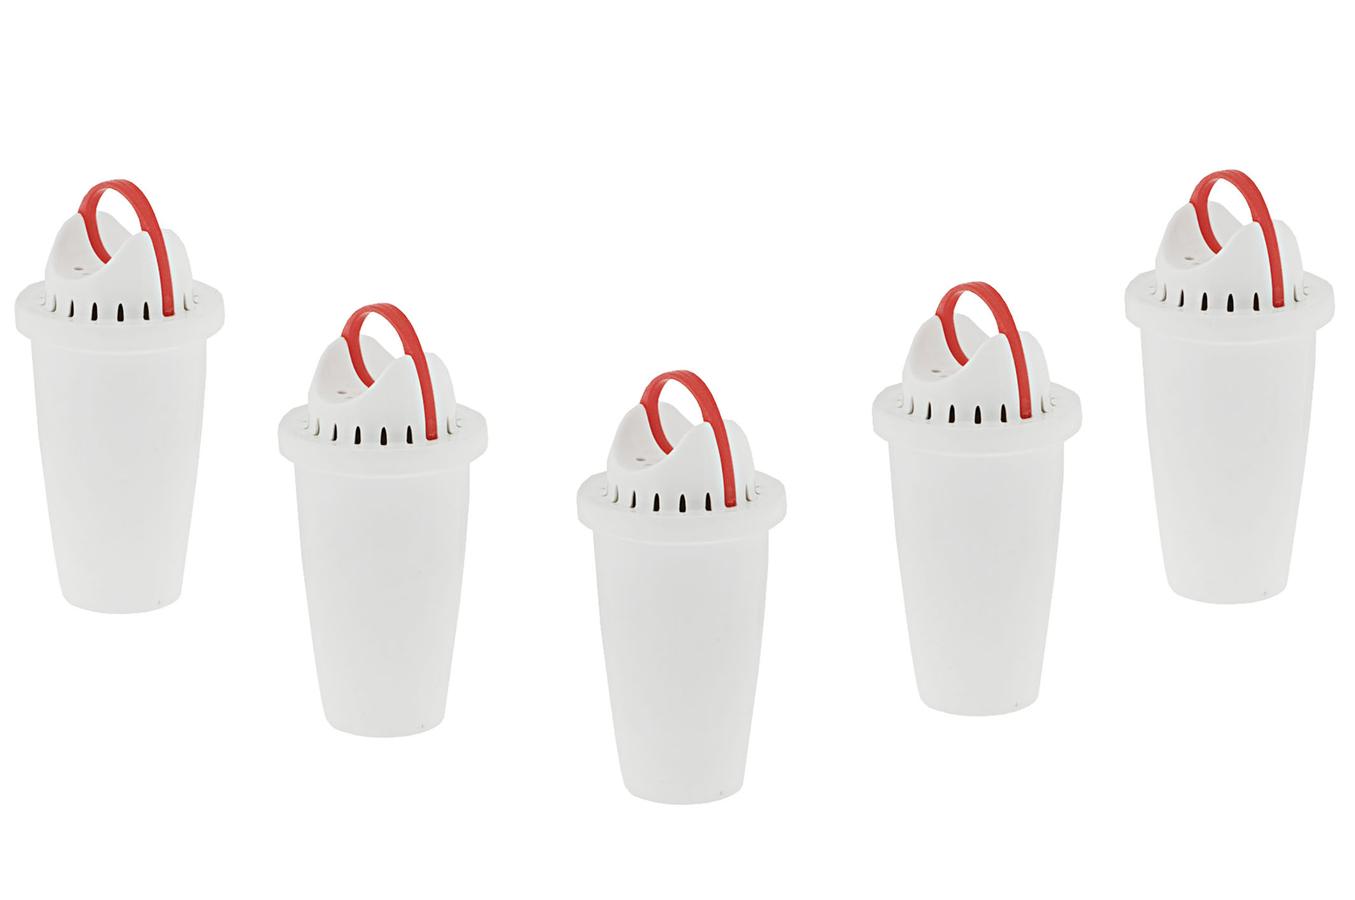 cartouche filtre eau terraillon easy filtra 6 2 mois 1298330 darty. Black Bedroom Furniture Sets. Home Design Ideas